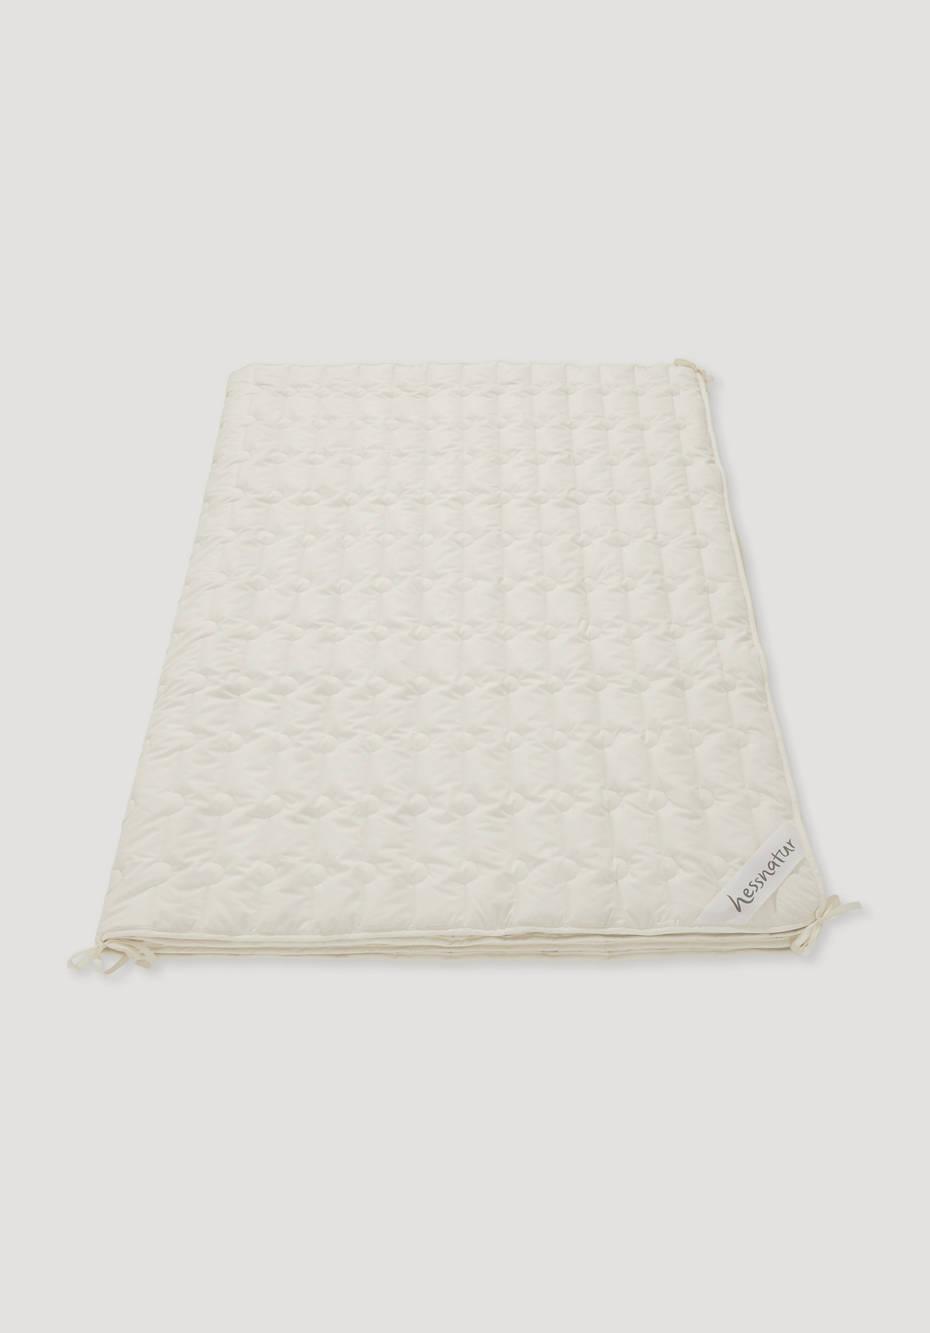 4-season blanket made of pure organic cotton